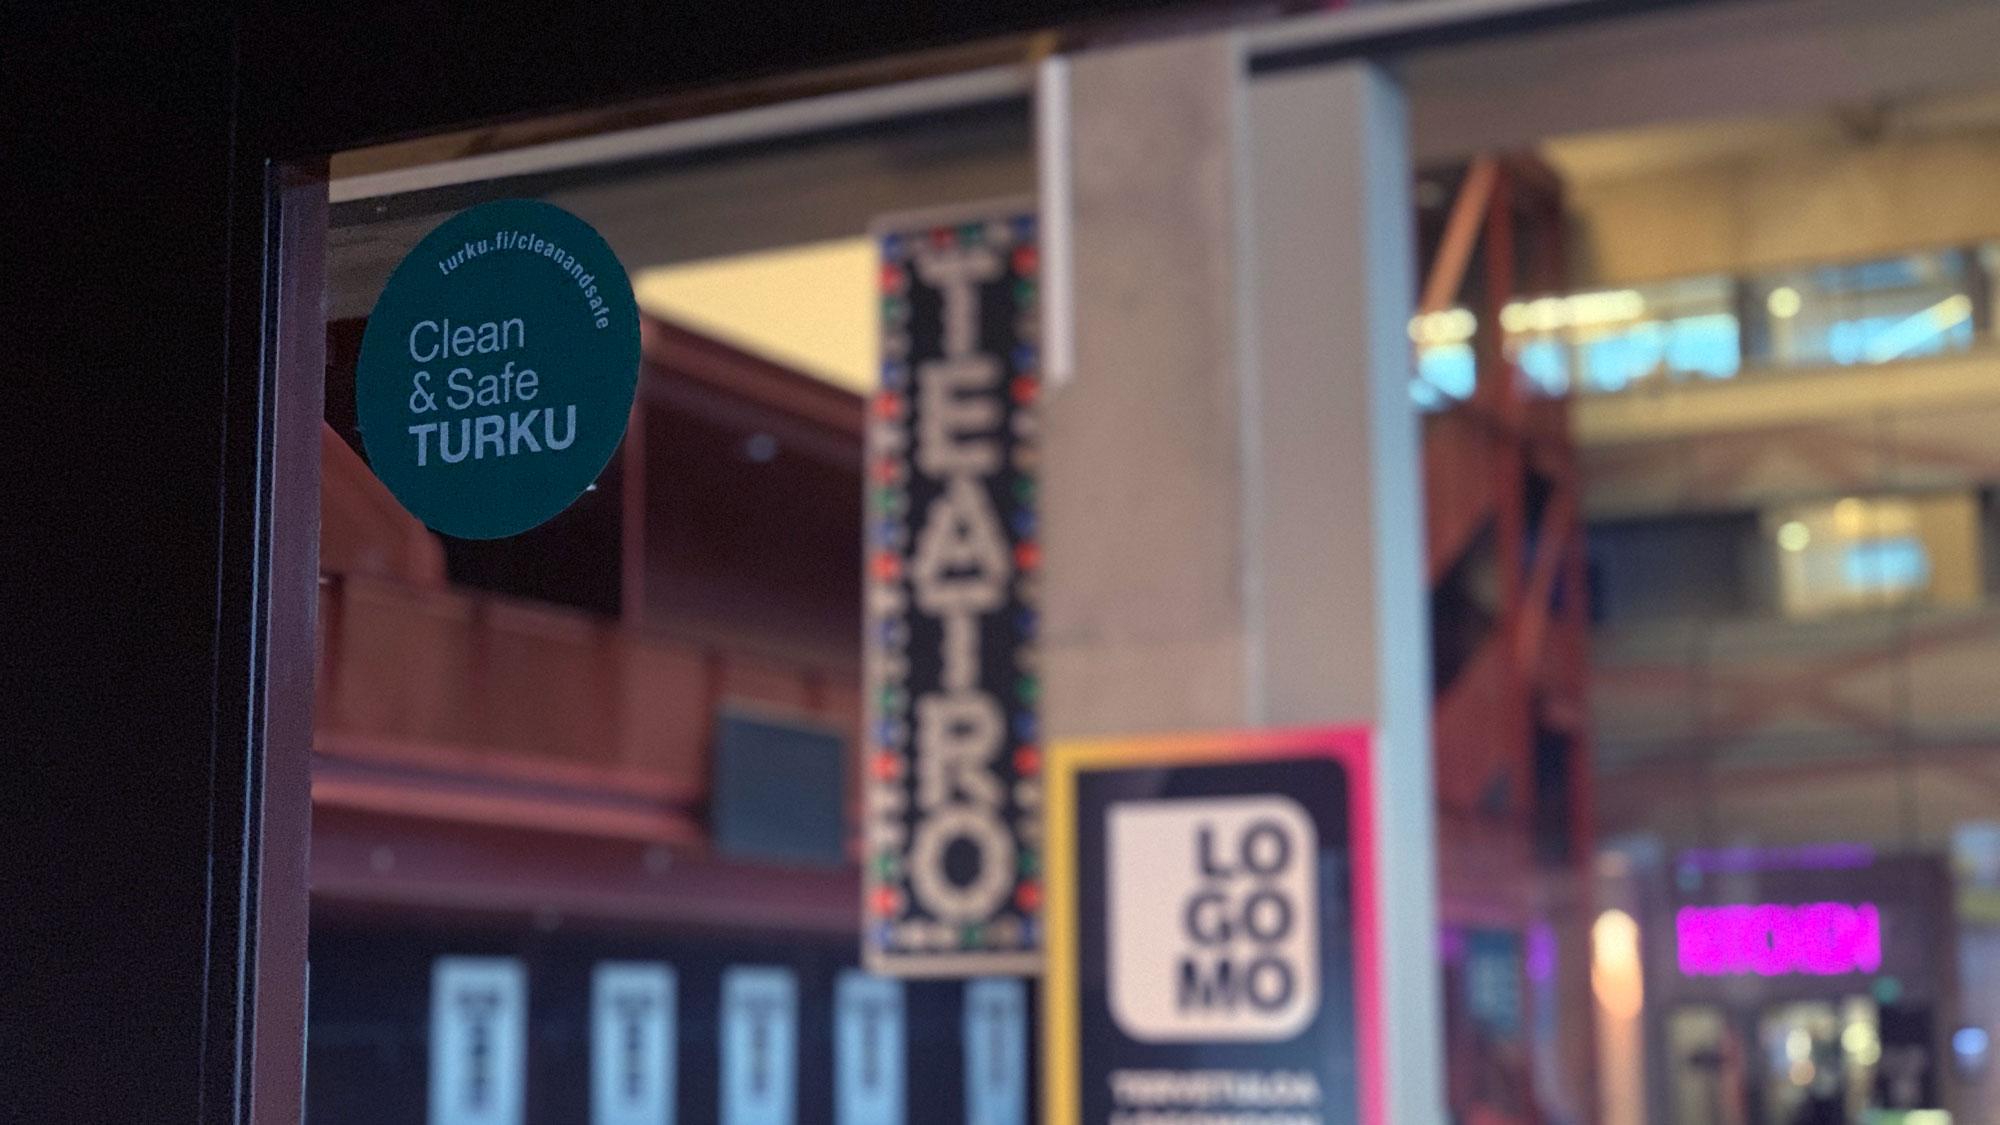 Logomo sai Clean & Safe Turku -tunnuksen